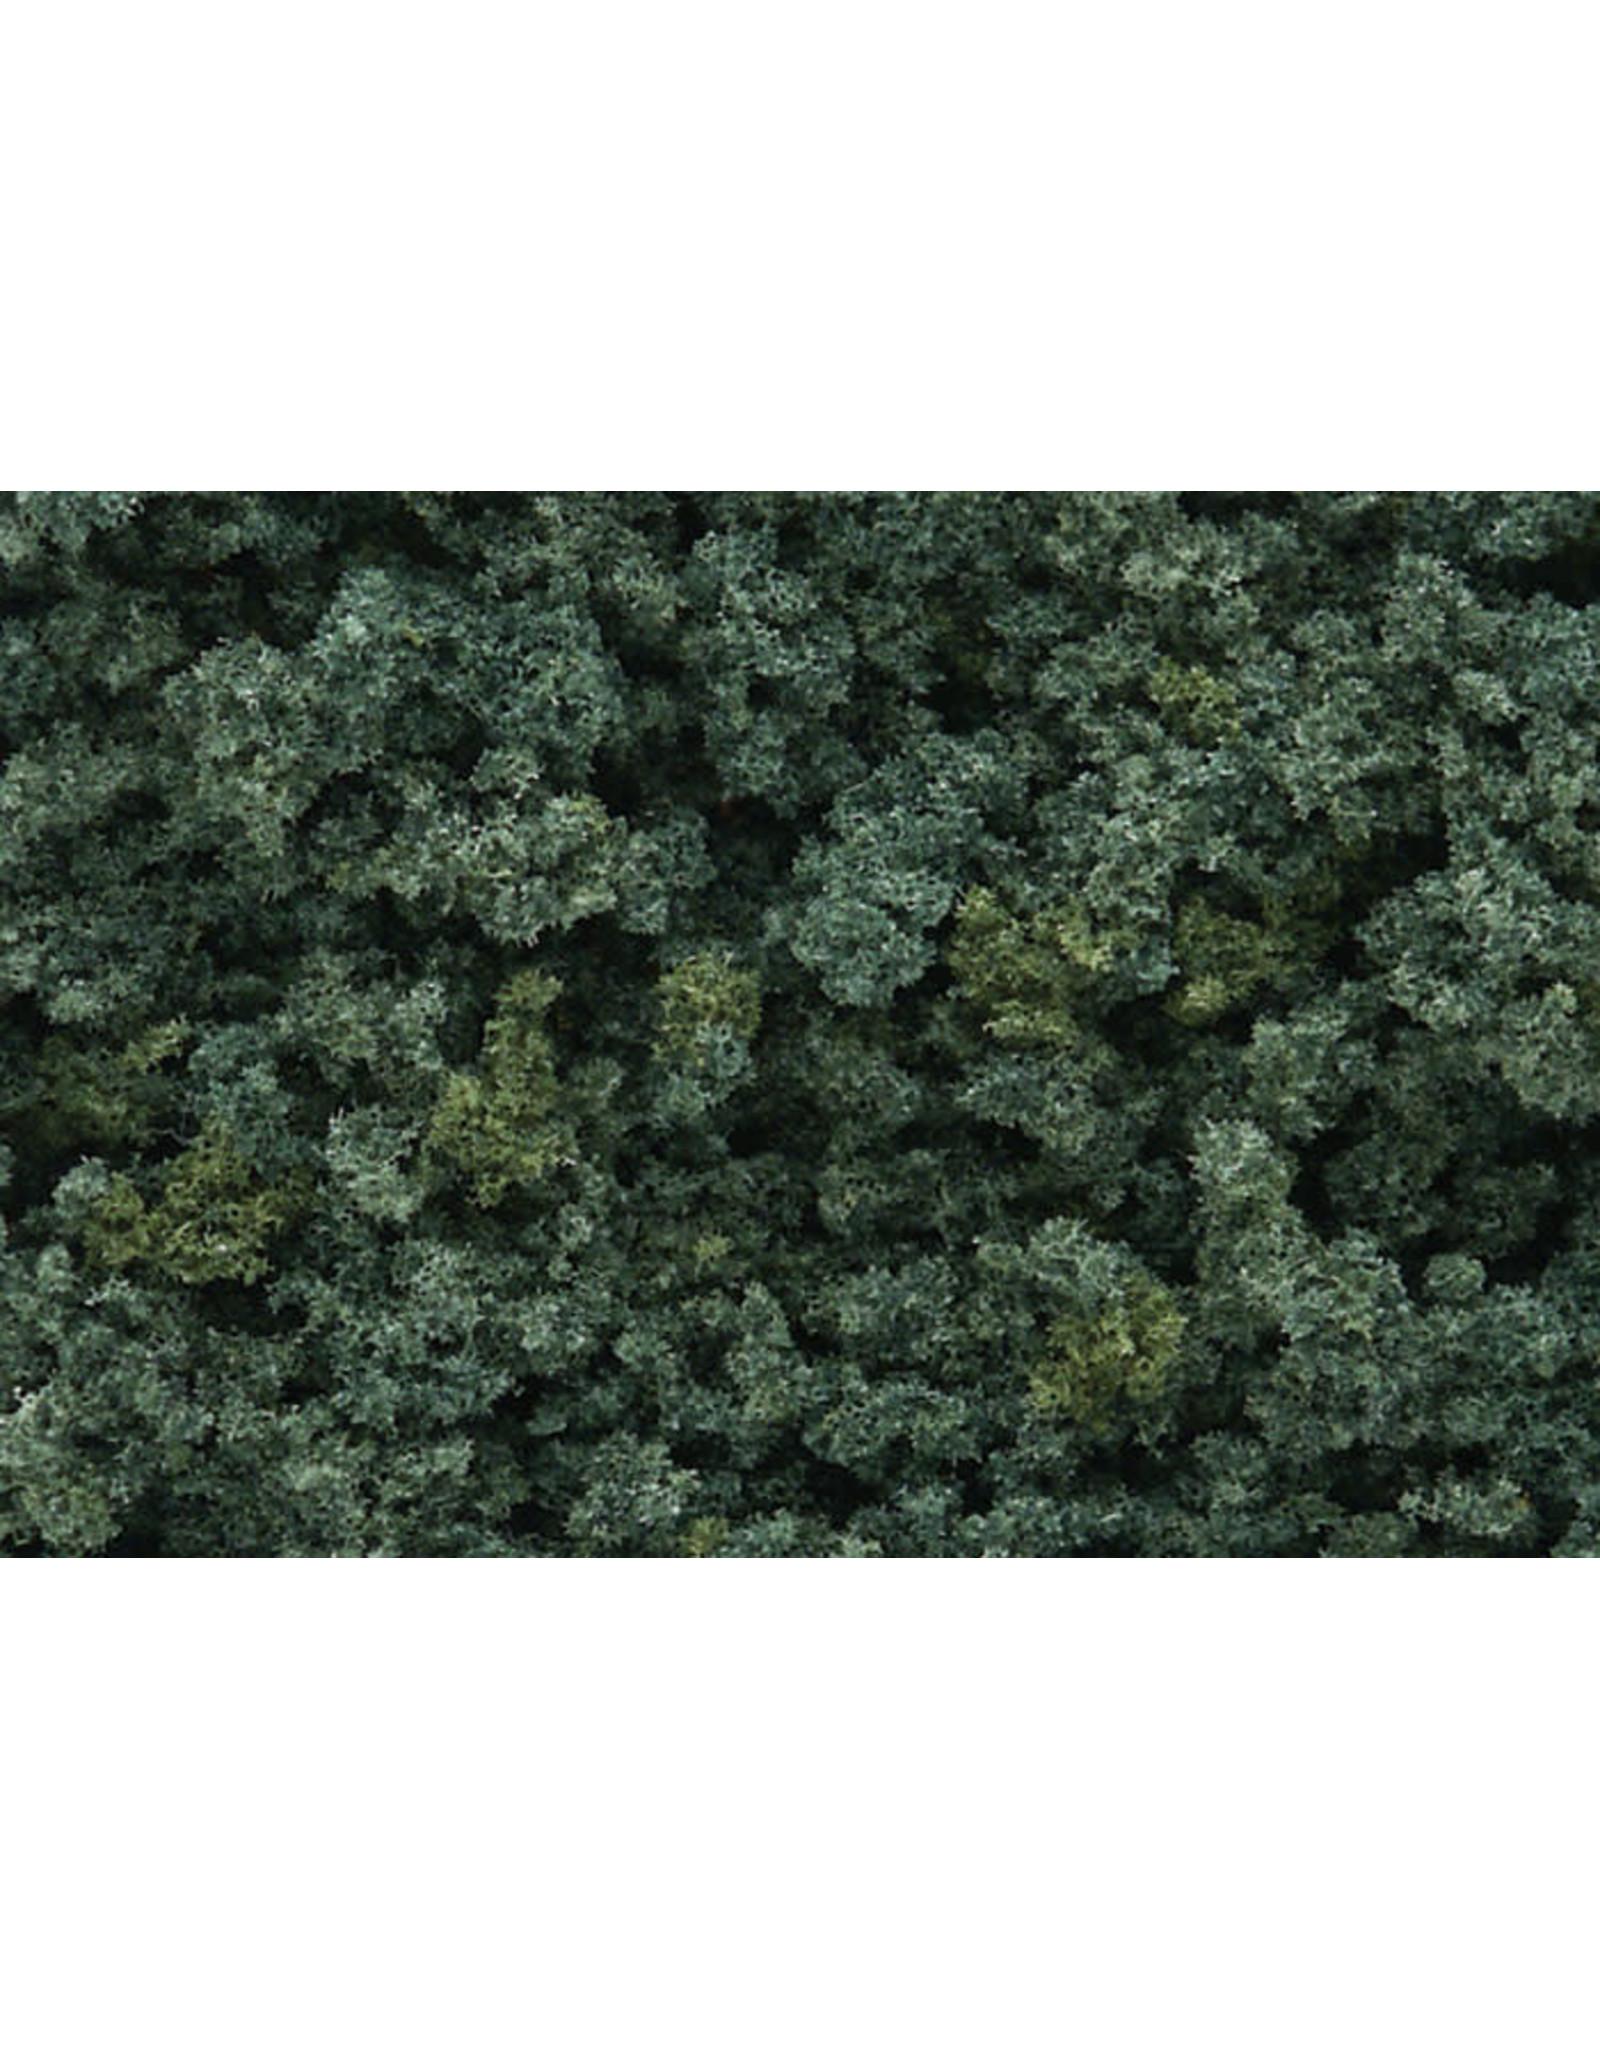 Woodland Scenics Underbrush Medium Green FC1636